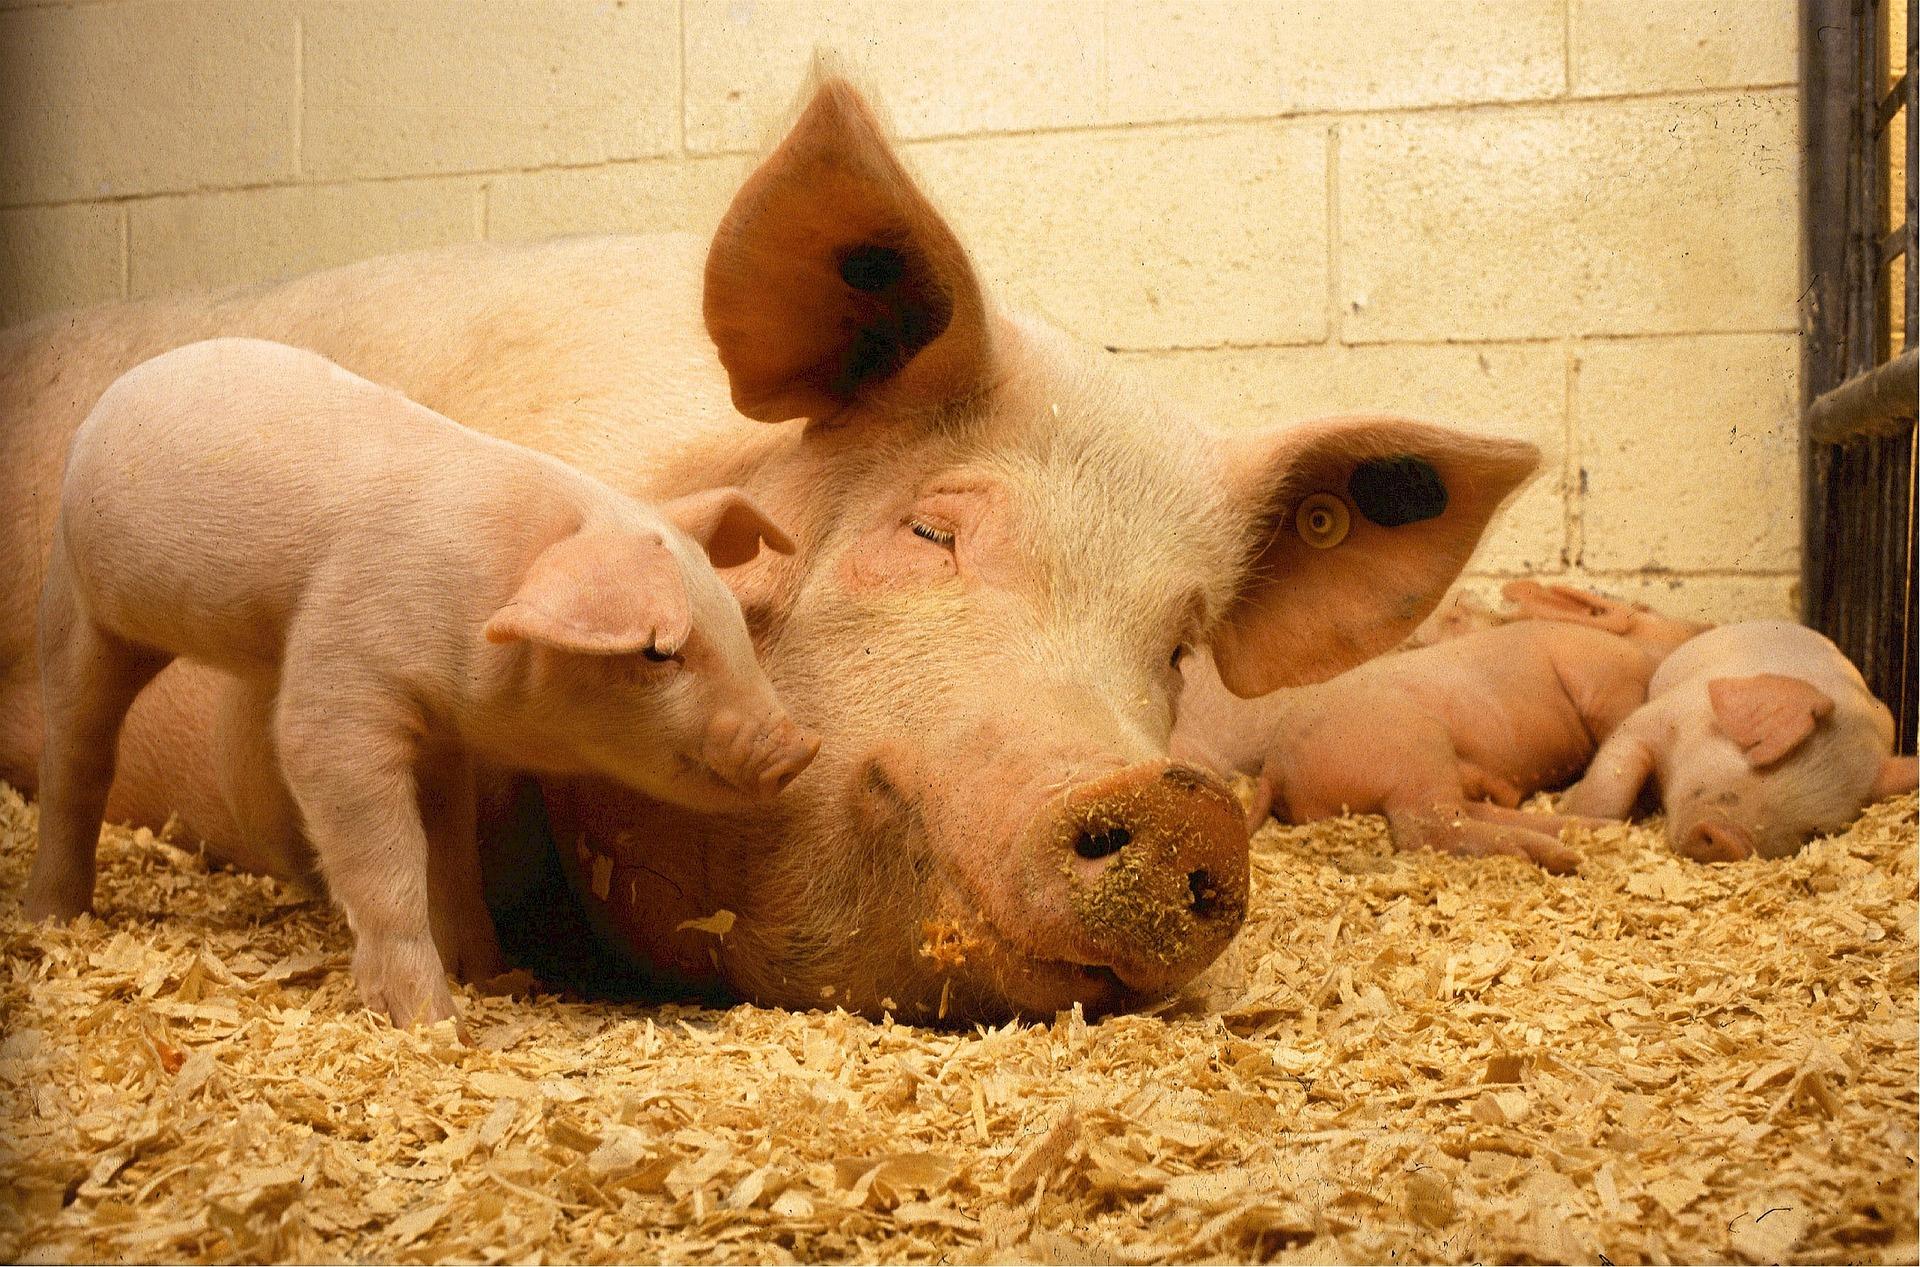 Verdienmodel vlees gaat niet zo snel overboord.